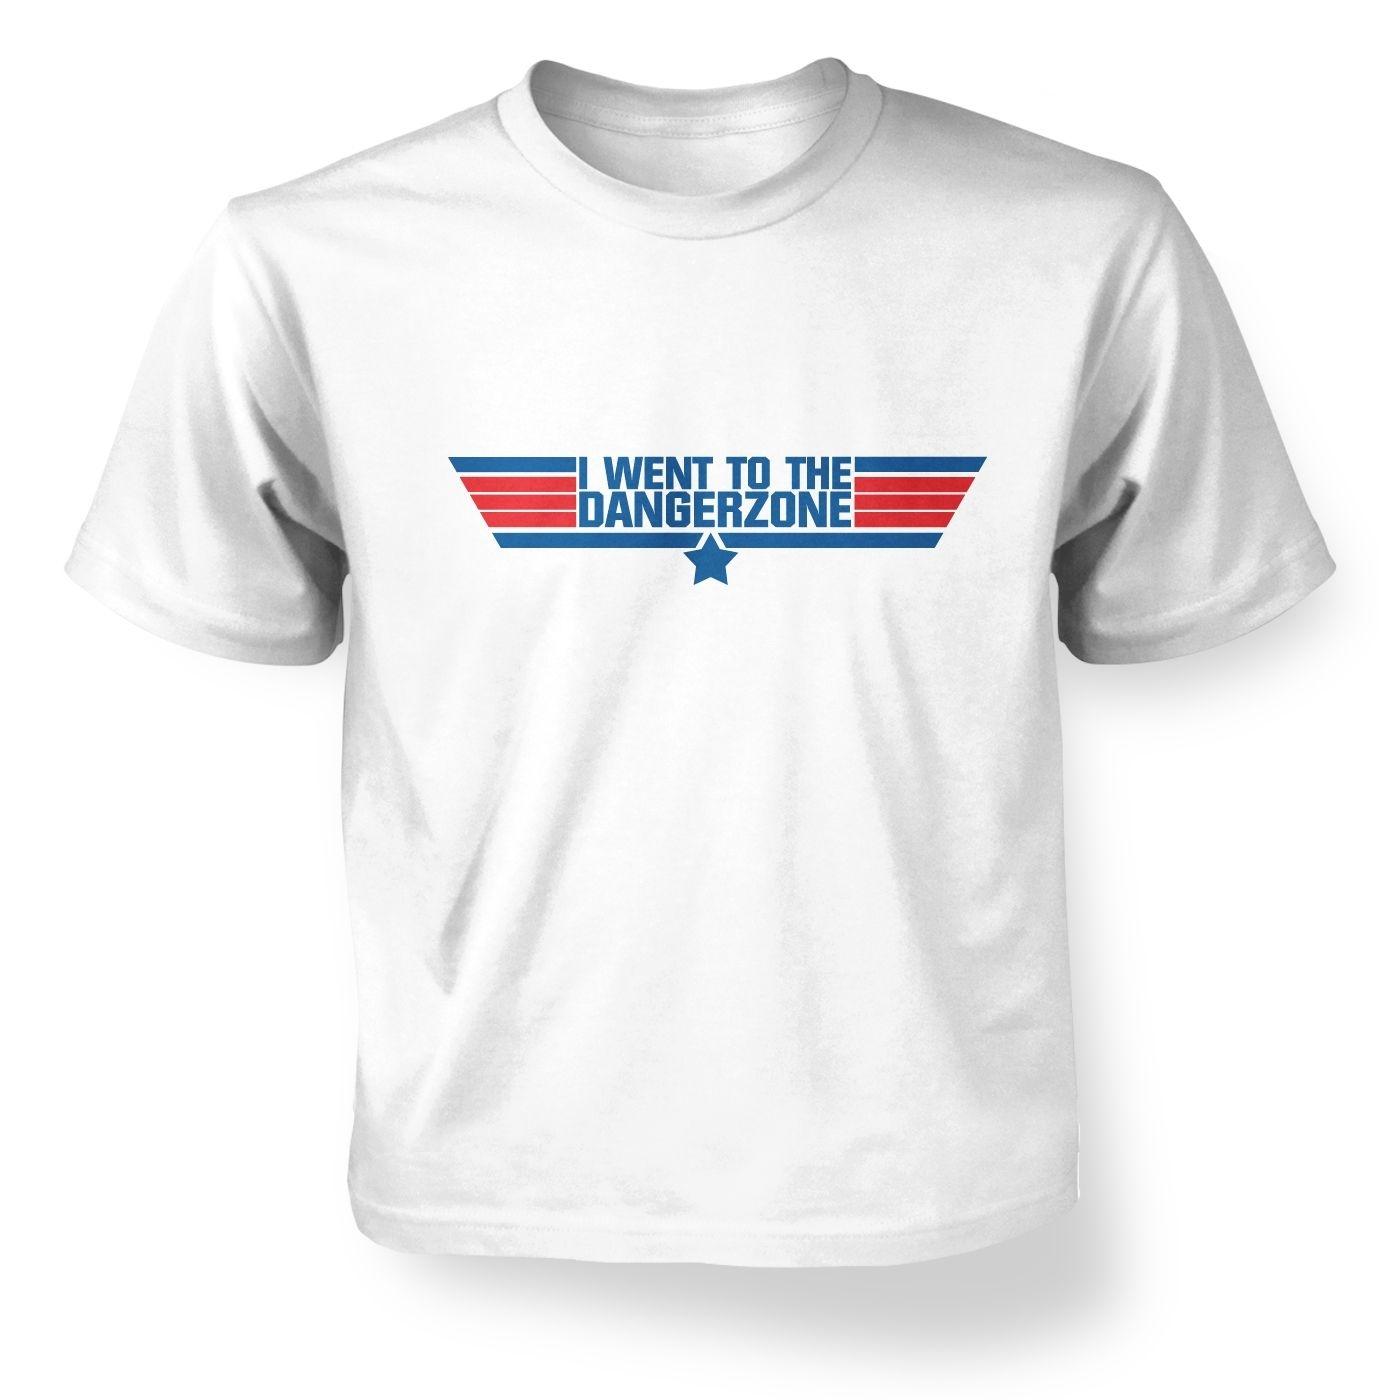 Dangerzone kids' t-shirt